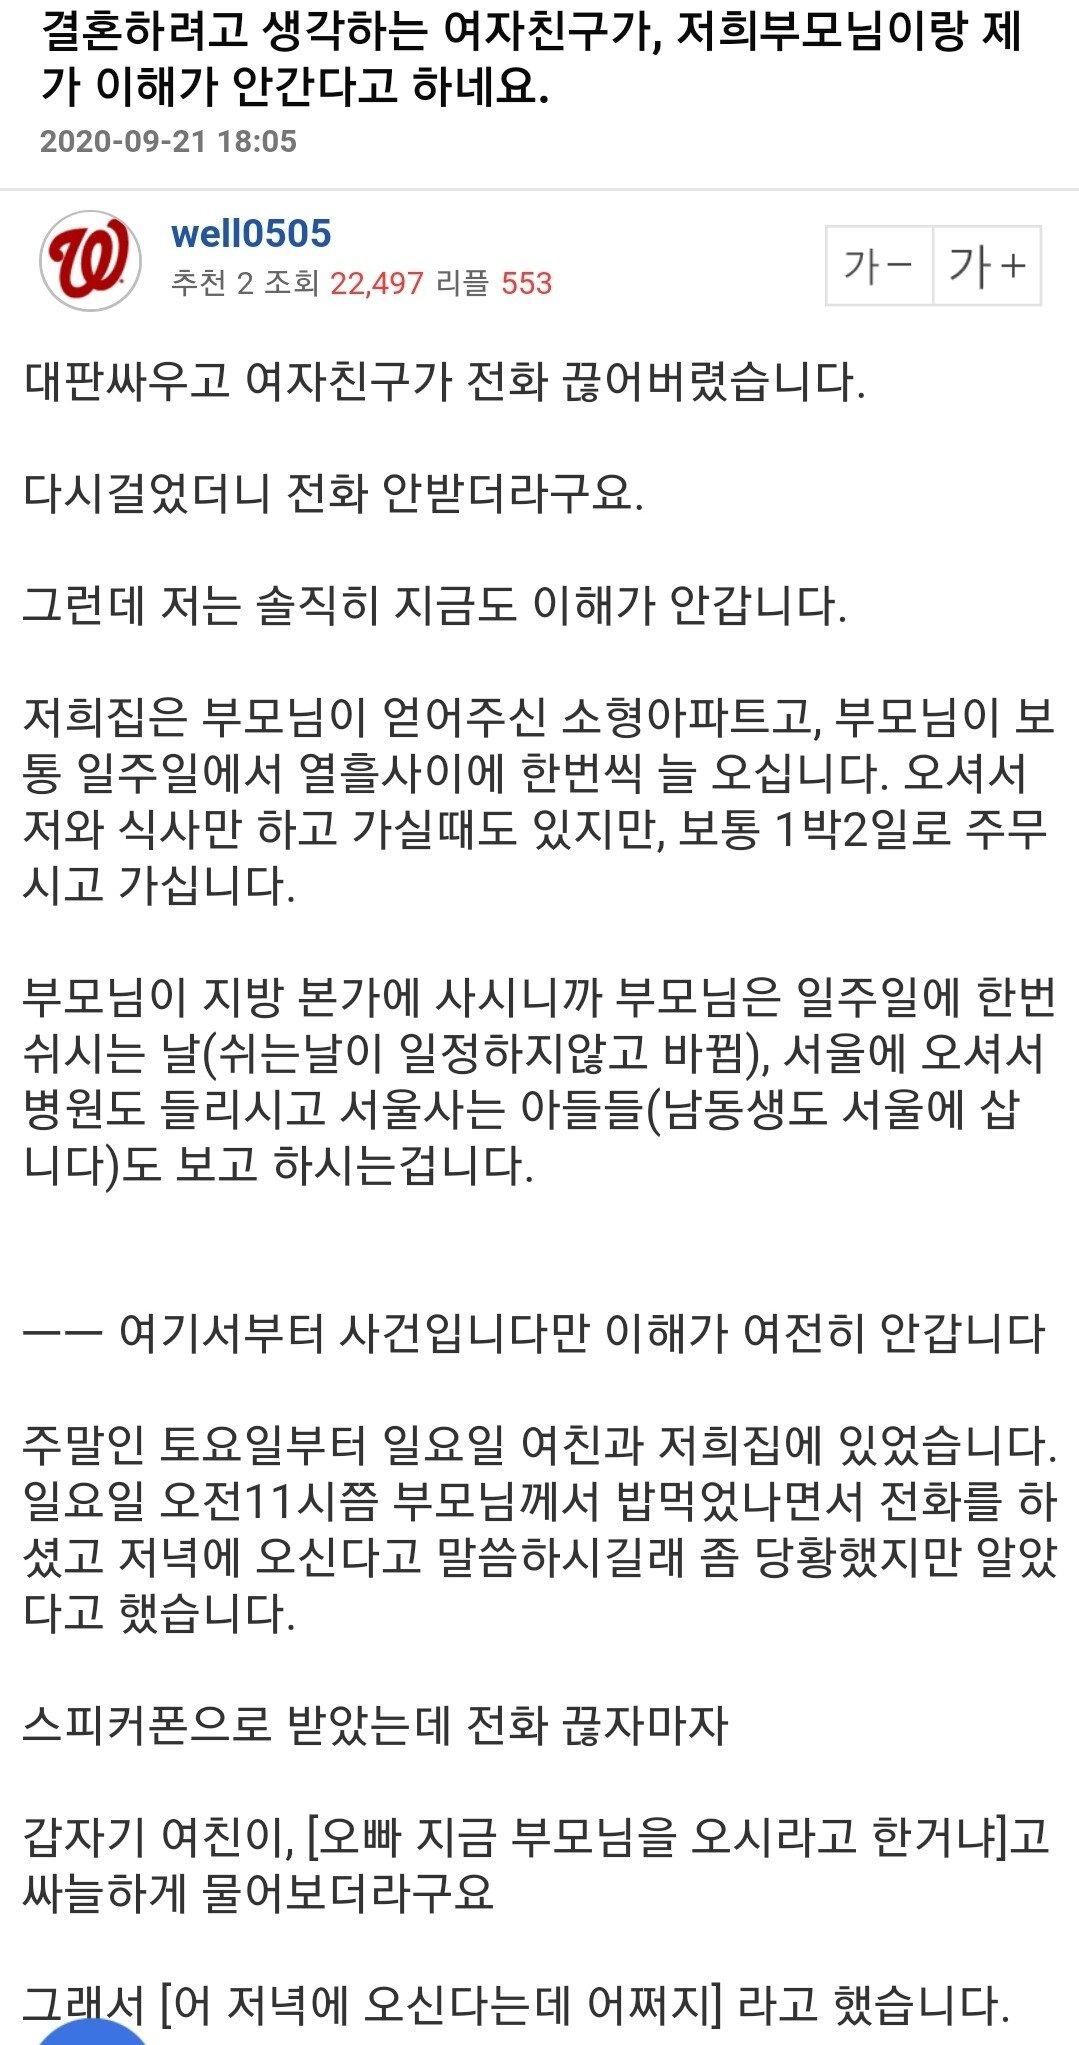 Screenshot_20200922-013735_Samsung Internet.jpg 현재 엠팍에서 핫한글